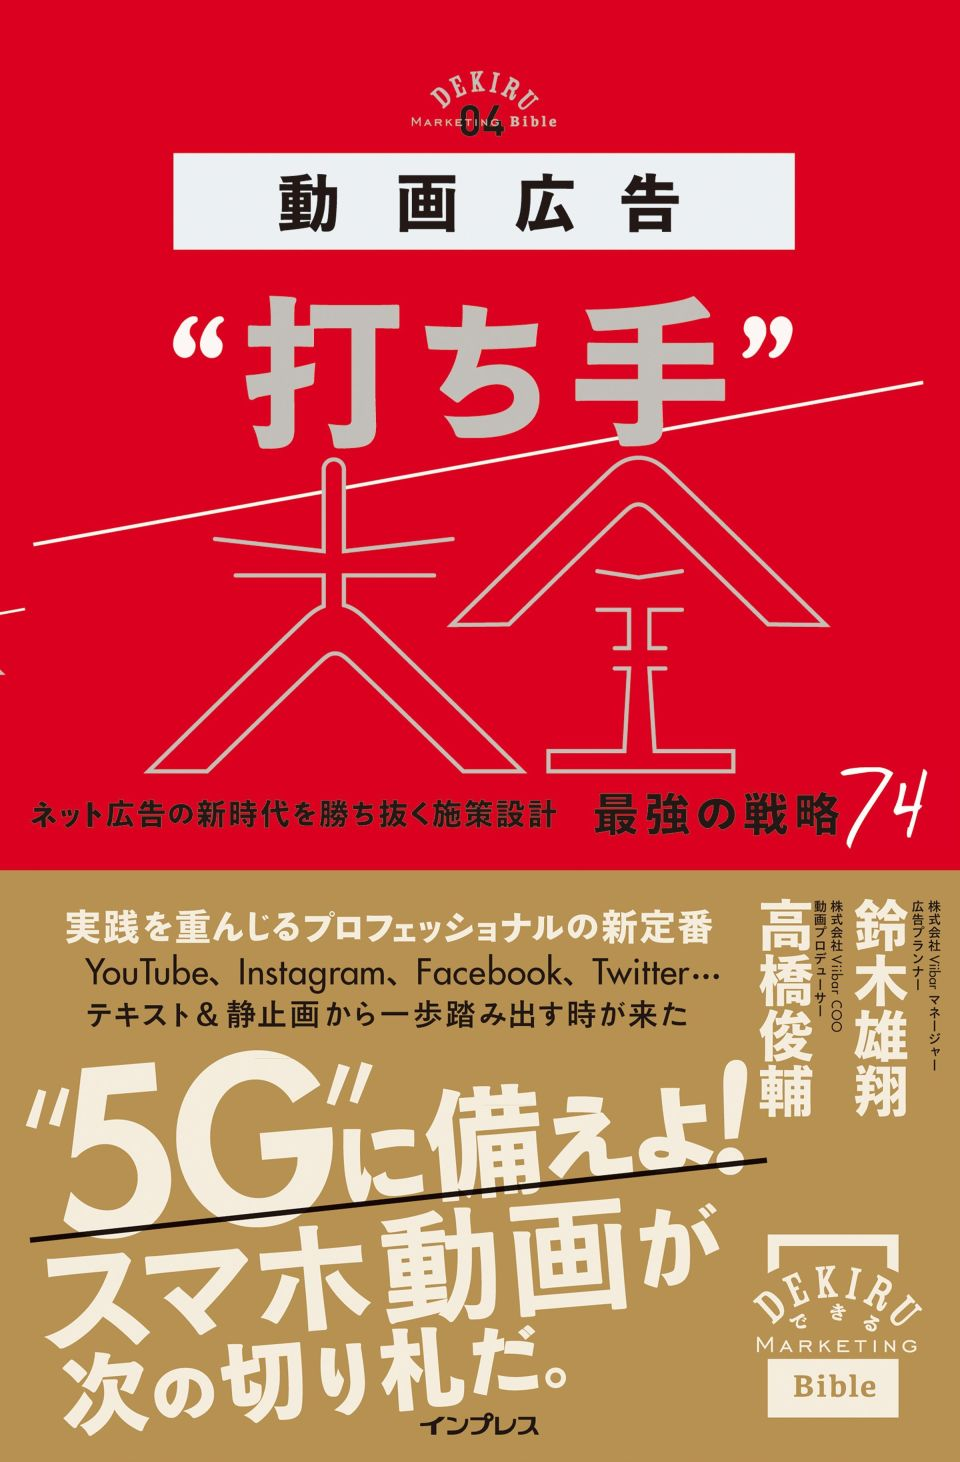 "「5G」に備える!スマホ動画で成果を上げるための指南書『動画広告""打ち手""大全』が発刊 1番目の画像"